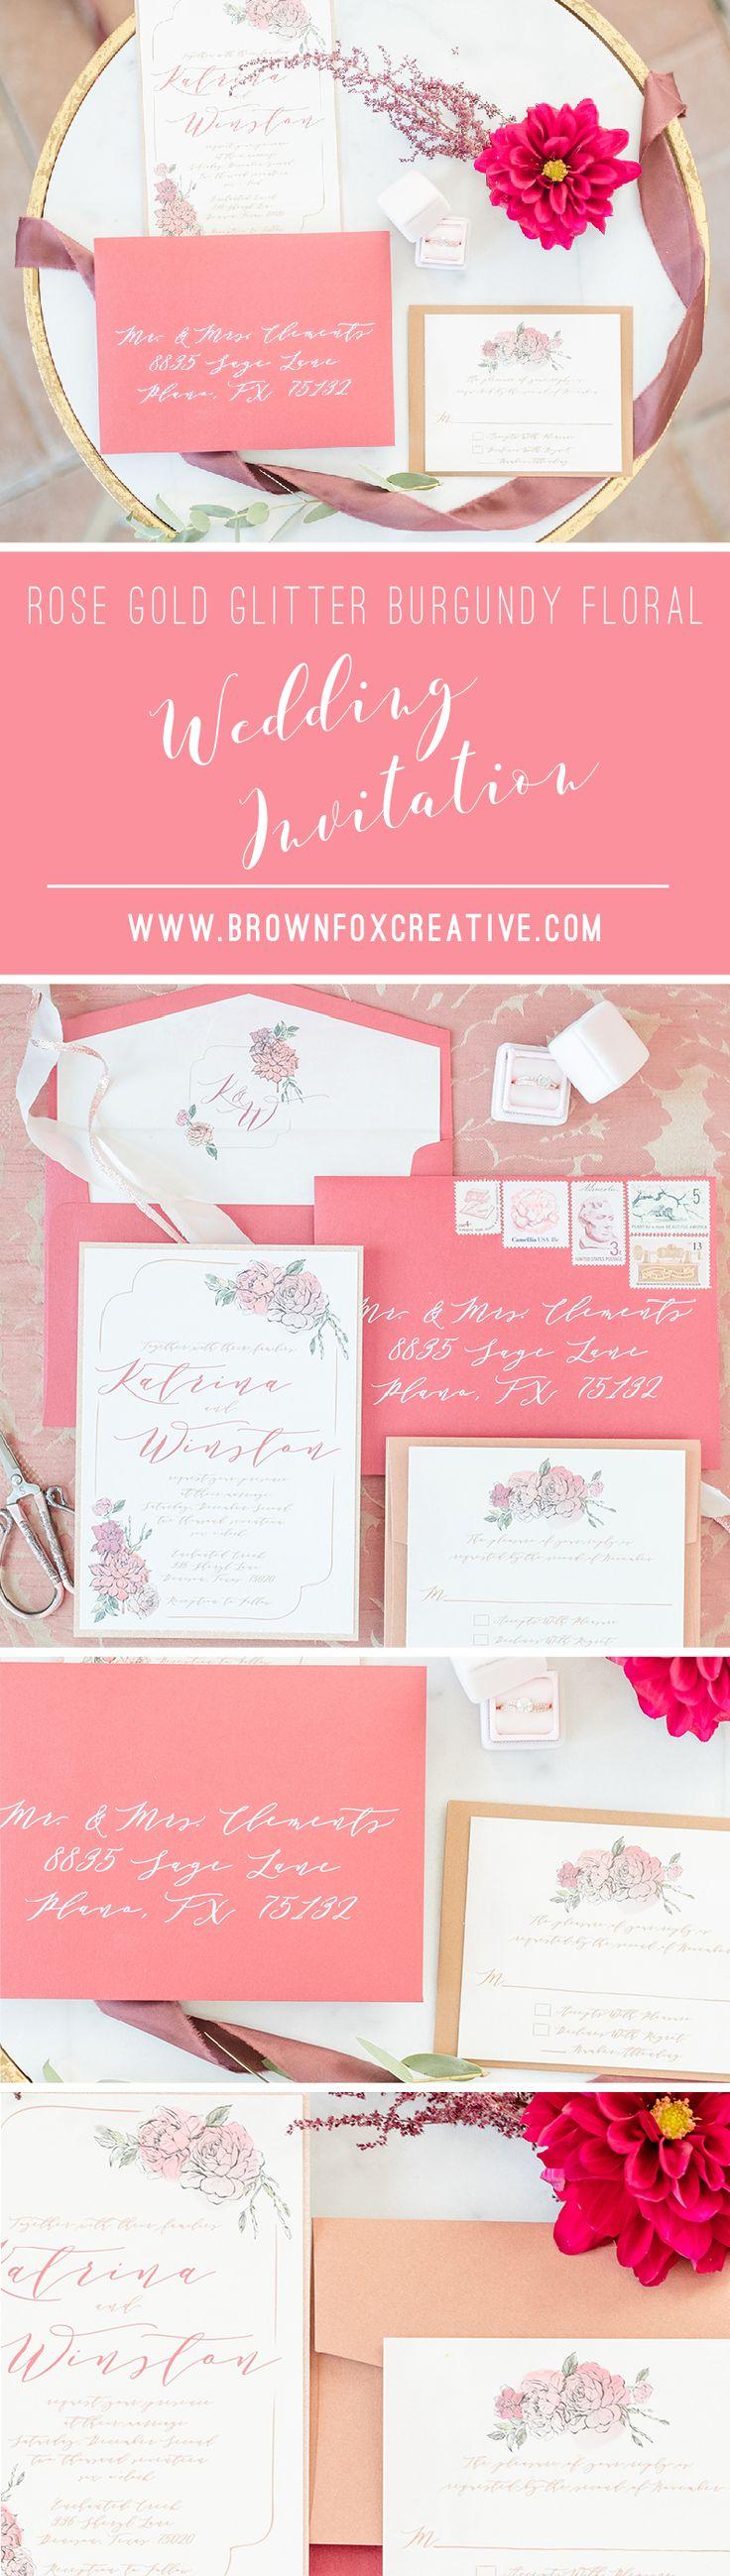 181 best wedding invitations images on pinterest